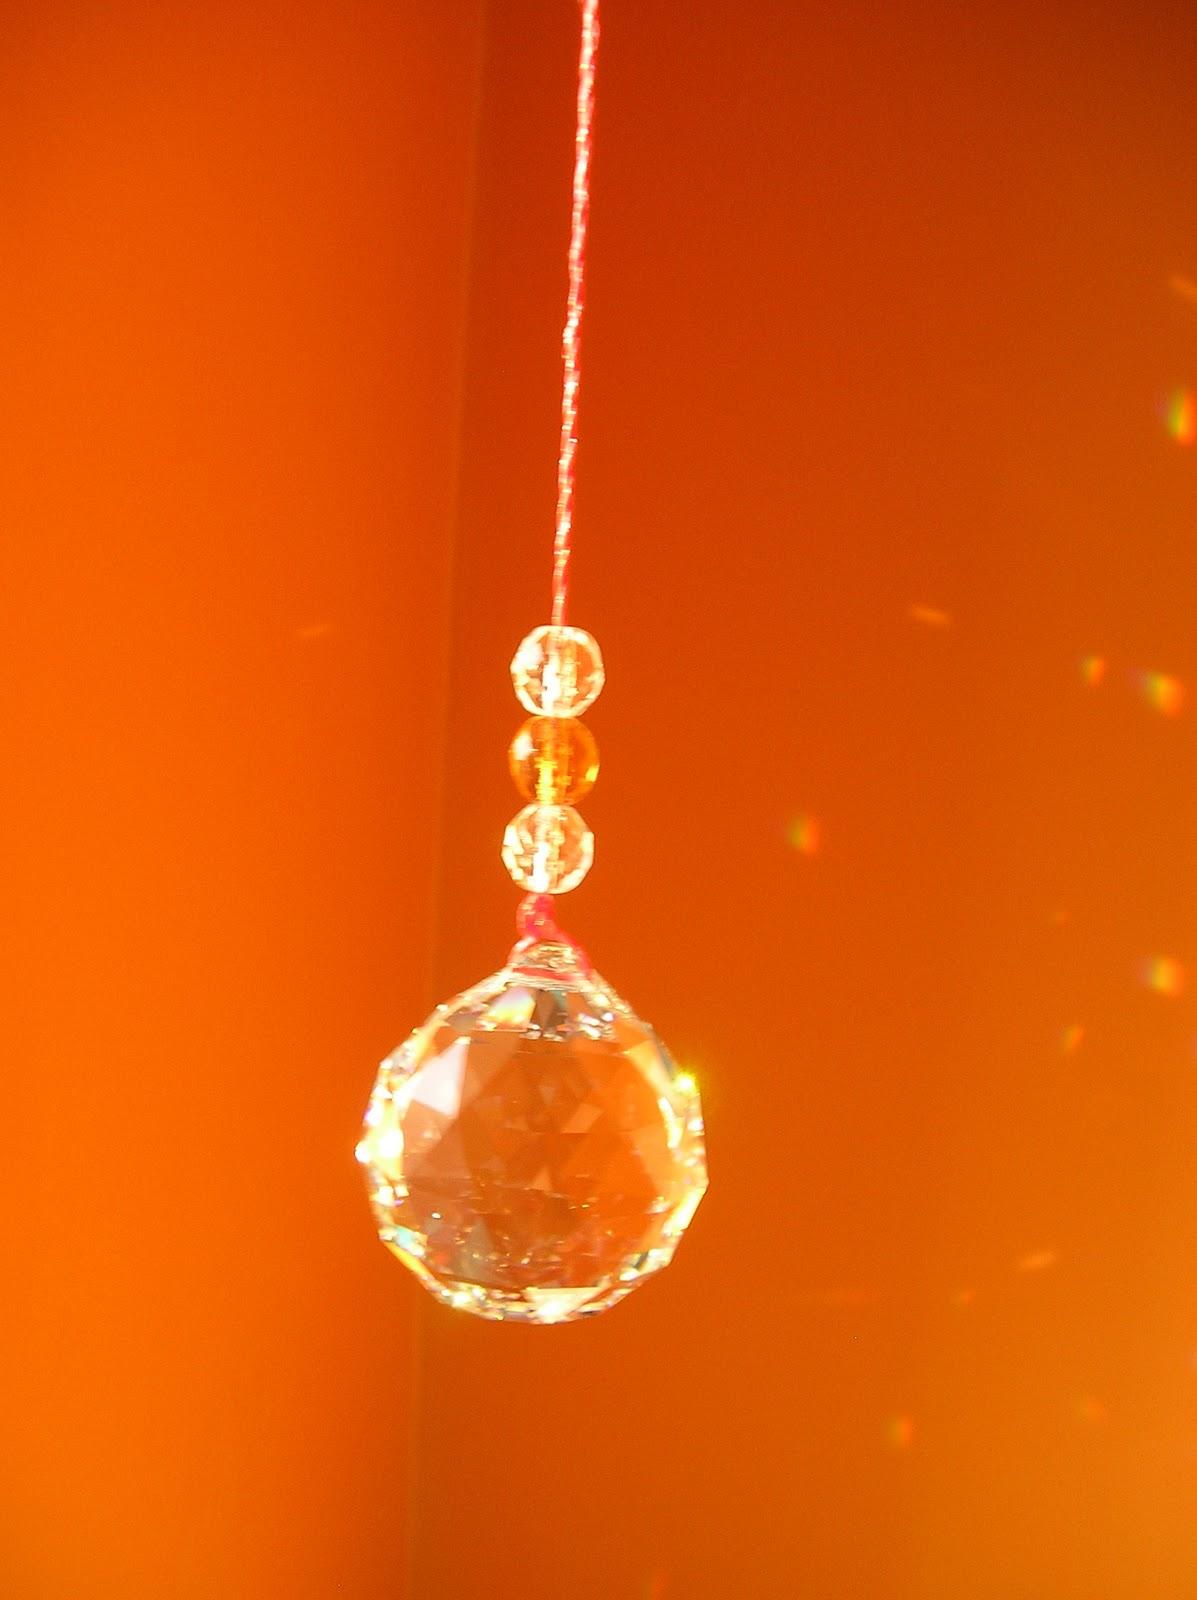 Chandra Veeresha: Cristal Mulifacetado e Feng Shui #A33000 1197x1600 Banheiro Com Feng Shui